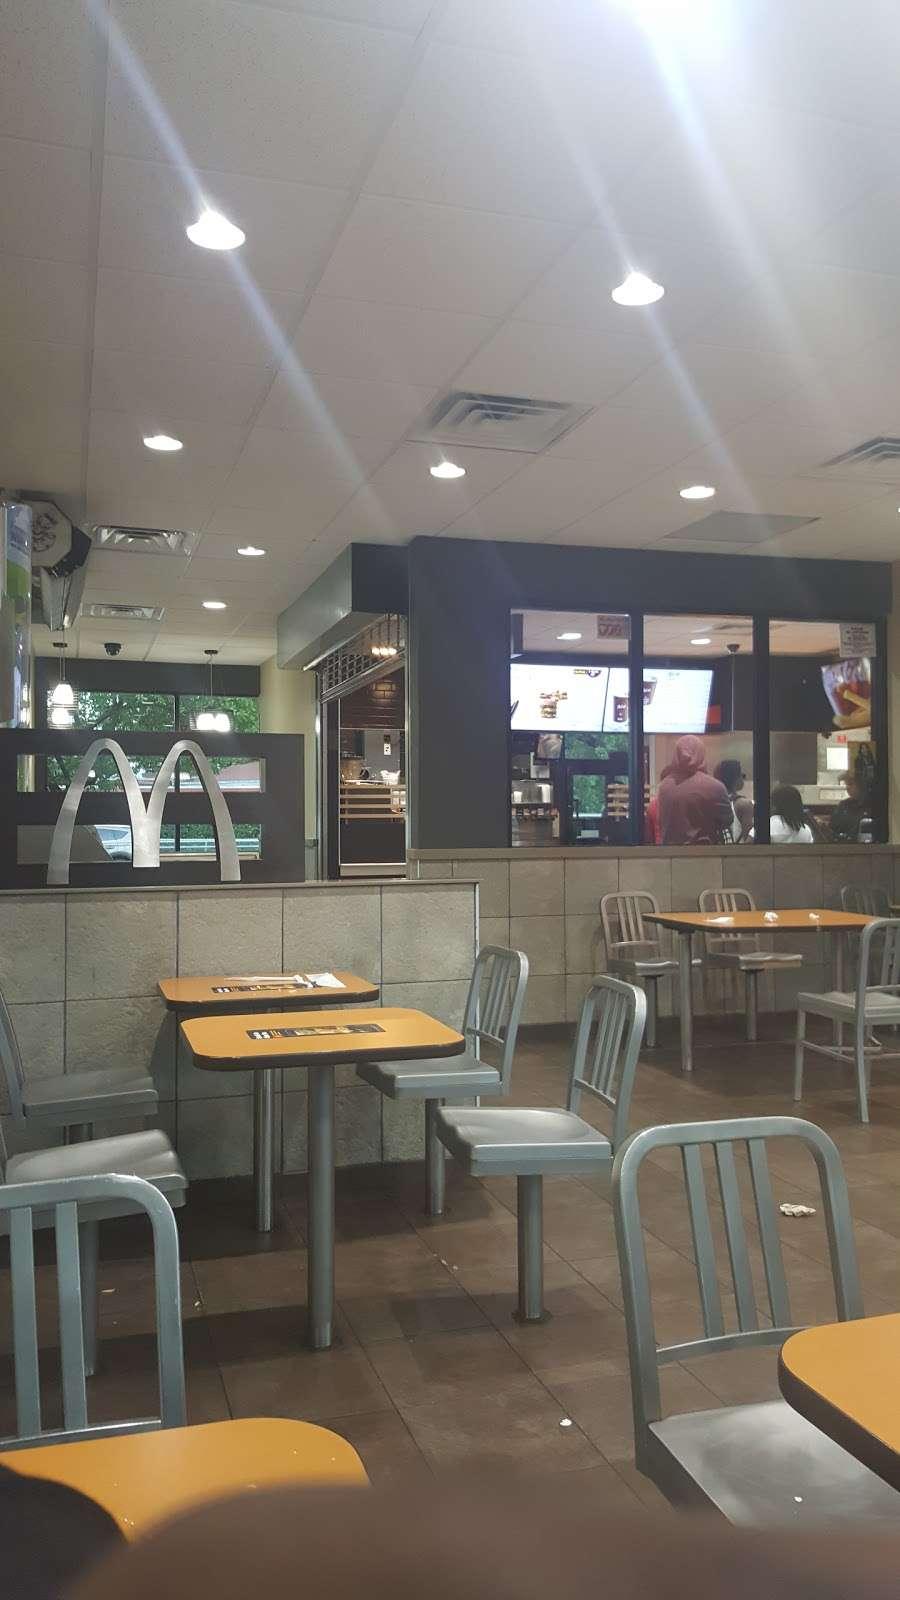 McDonalds - cafe  | Photo 3 of 10 | Address: 1930 Opa-Locka Blvd, Miami, FL 33167, USA | Phone: (305) 685-8855